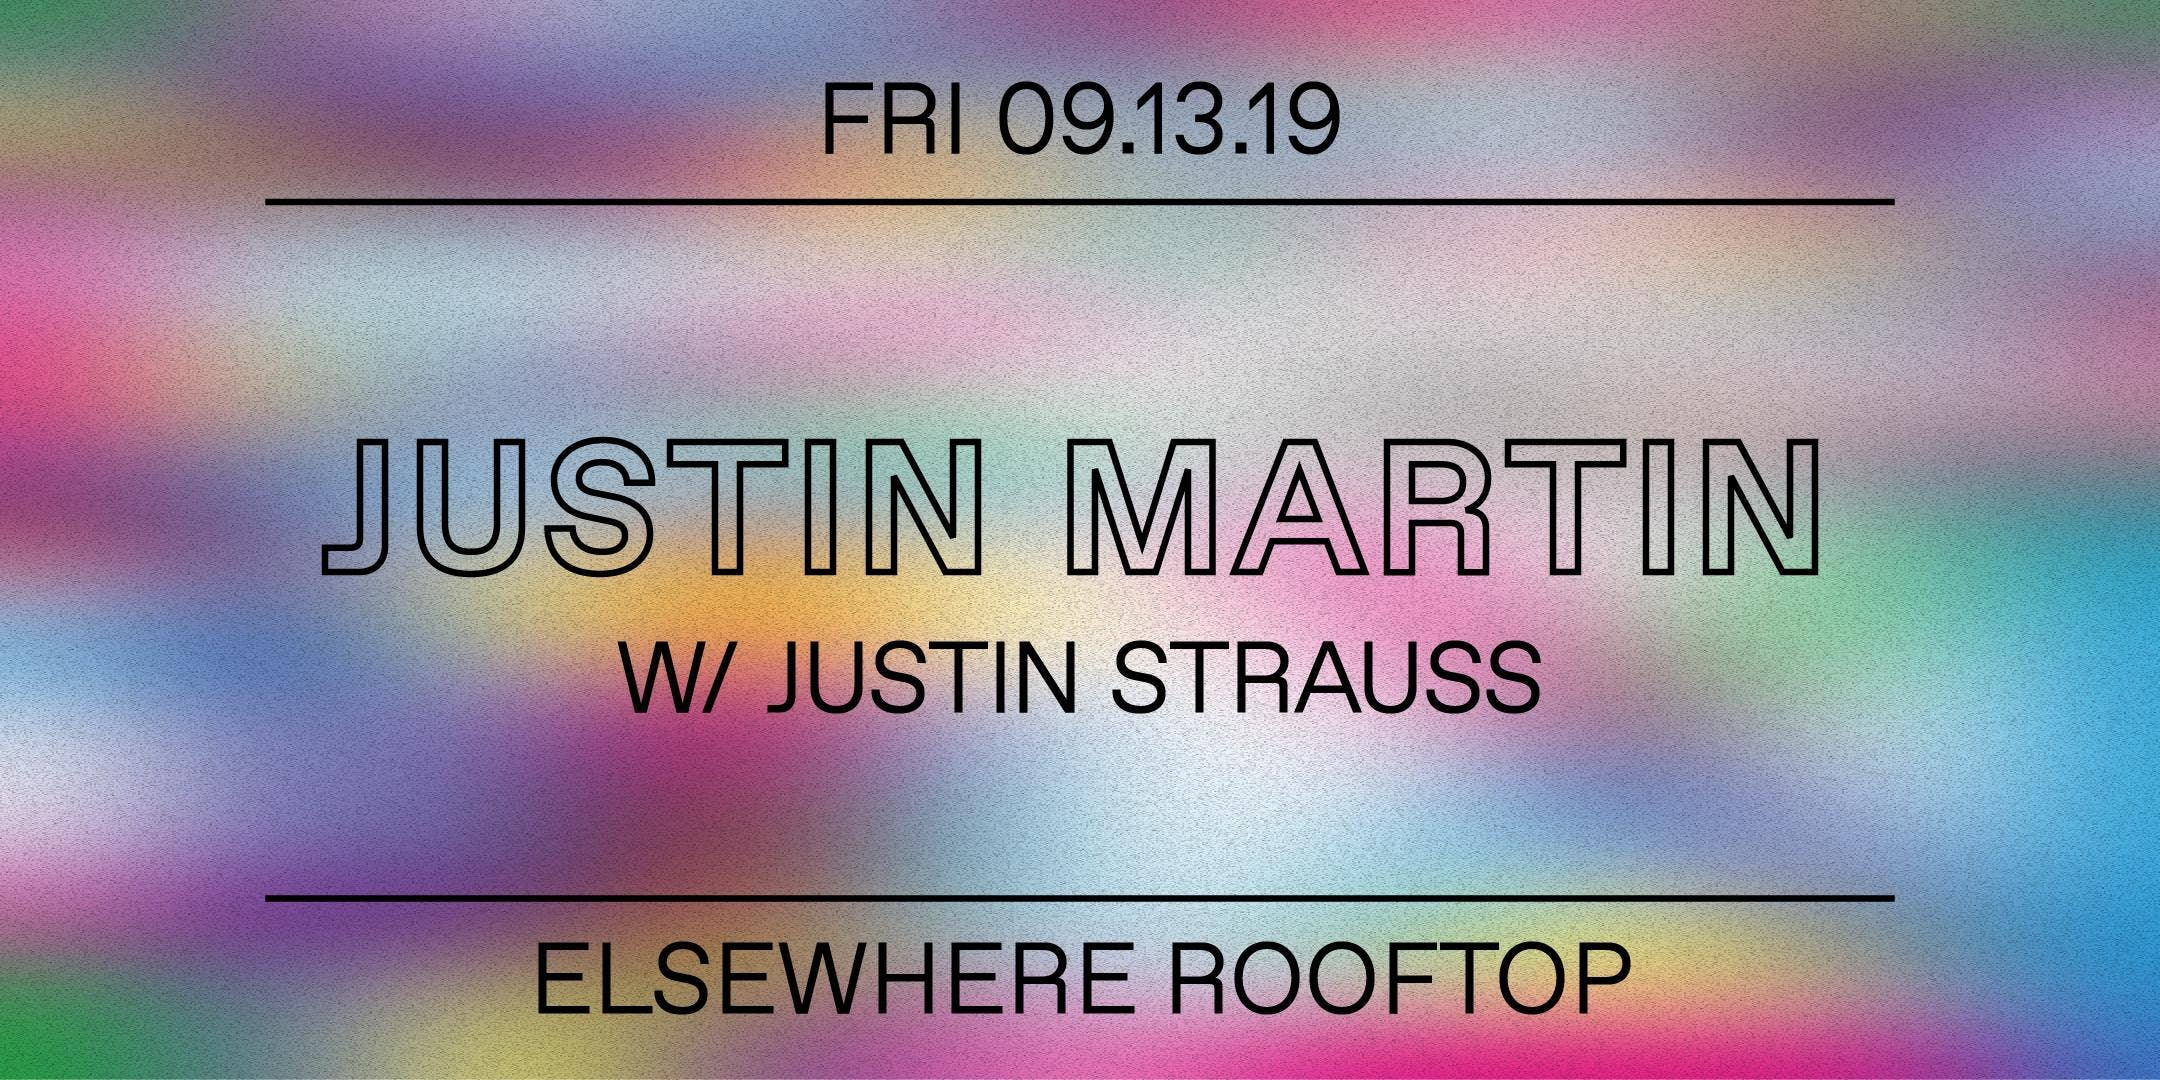 Justin Martin, Justin Strauss